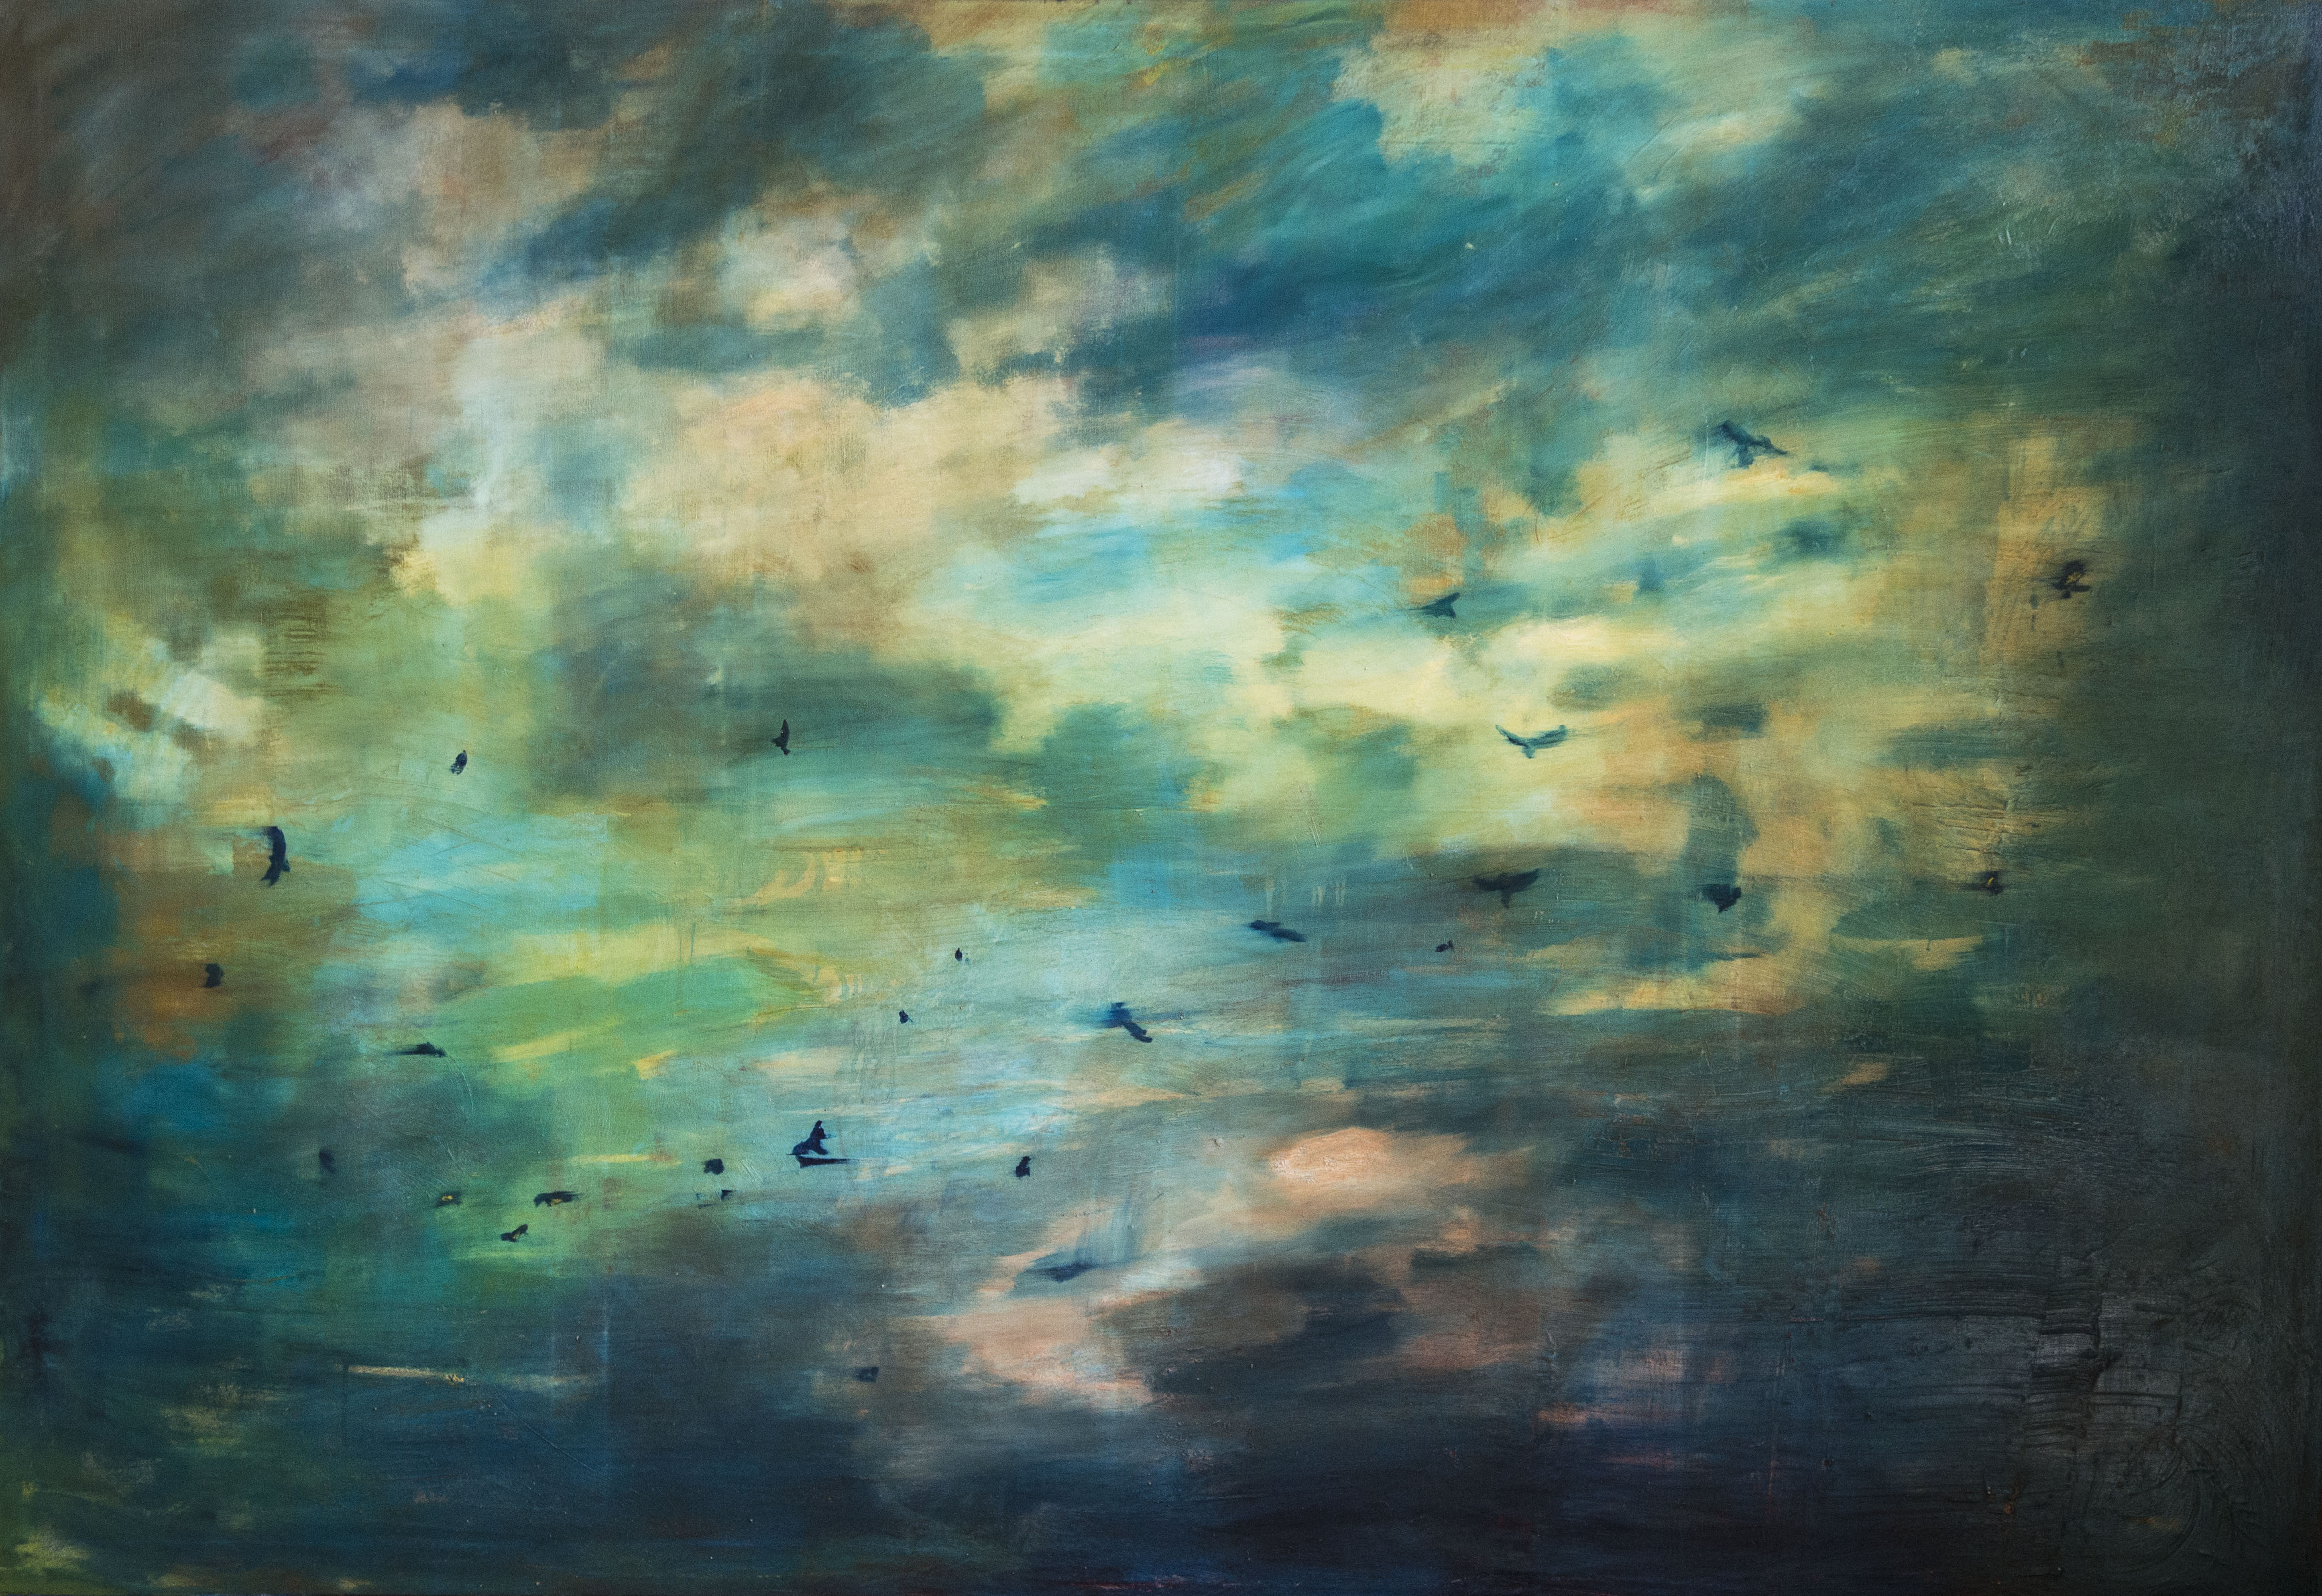 L'Envol_180x260cm_huile sur toile_2016_©Gaëlle Hamalian-Testud